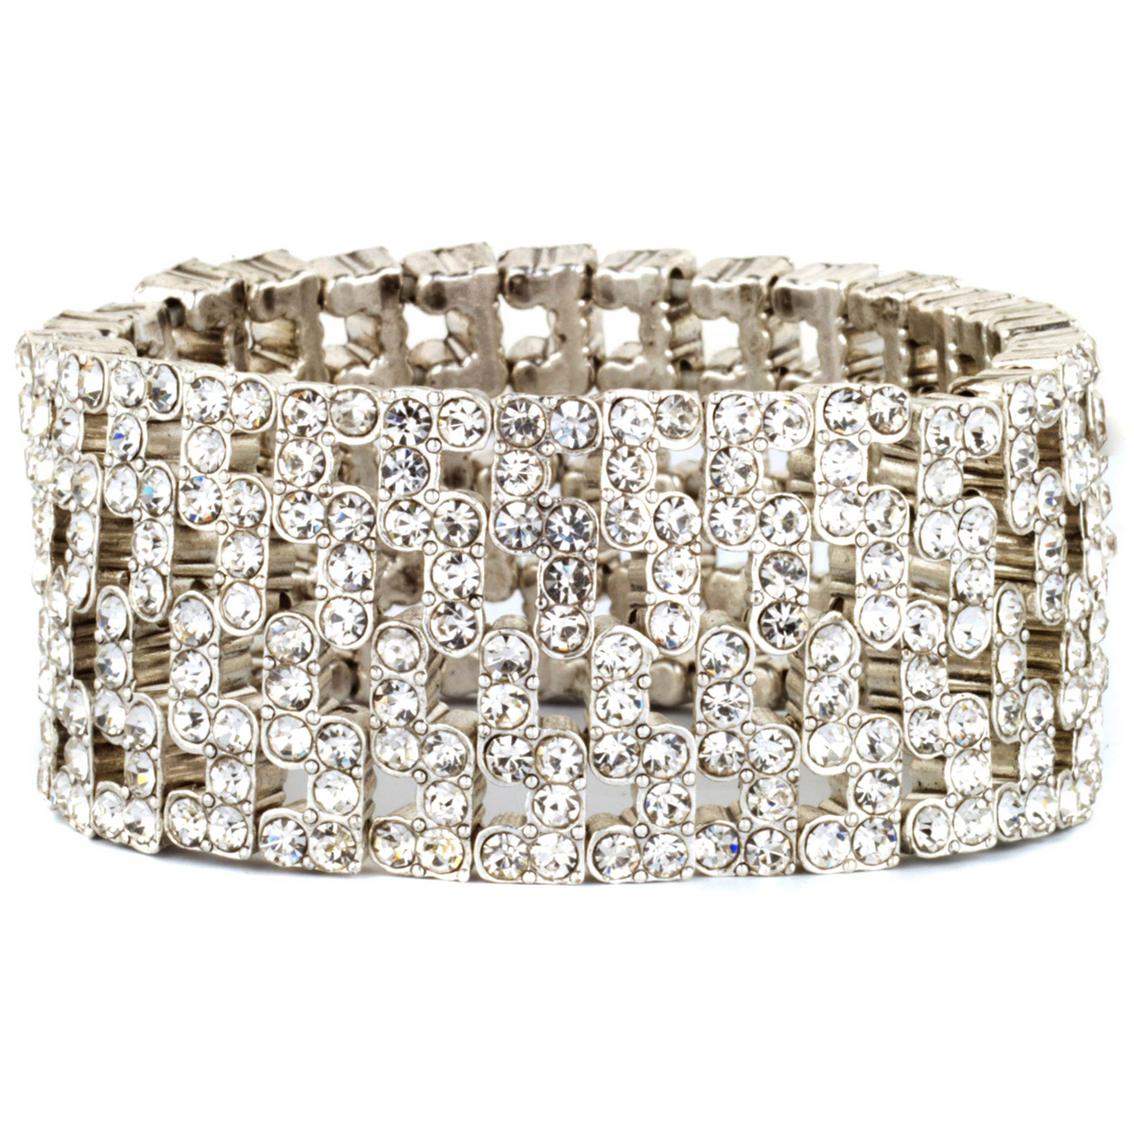 Anne Klein Silvertone Crystal Wide Stretch Bracelet